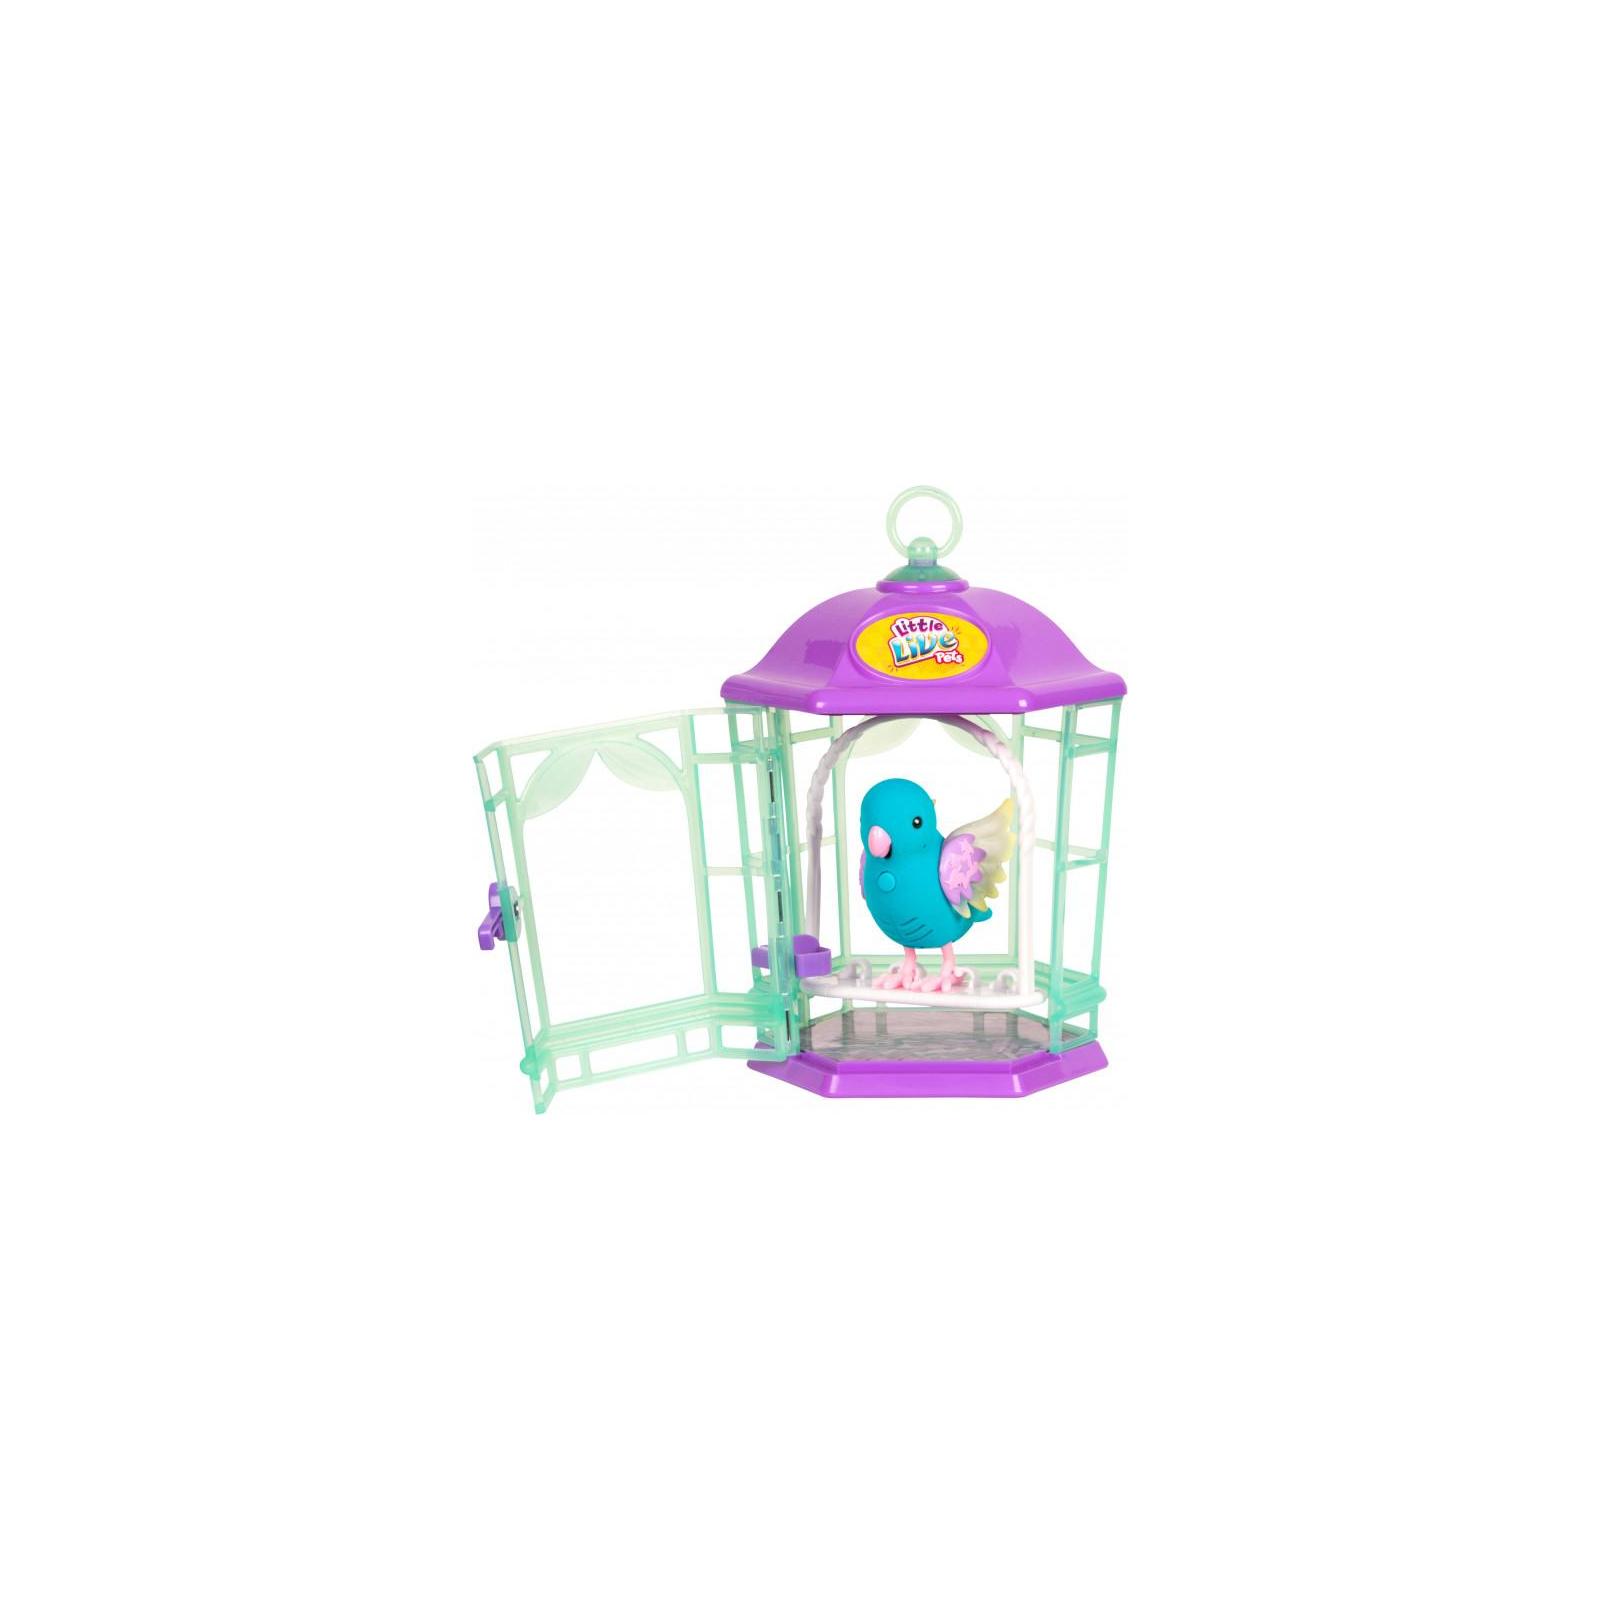 Интерактивная игрушка Moose Птичка в клетке Little Live Pets Skye Twinkles (28548) изображение 2